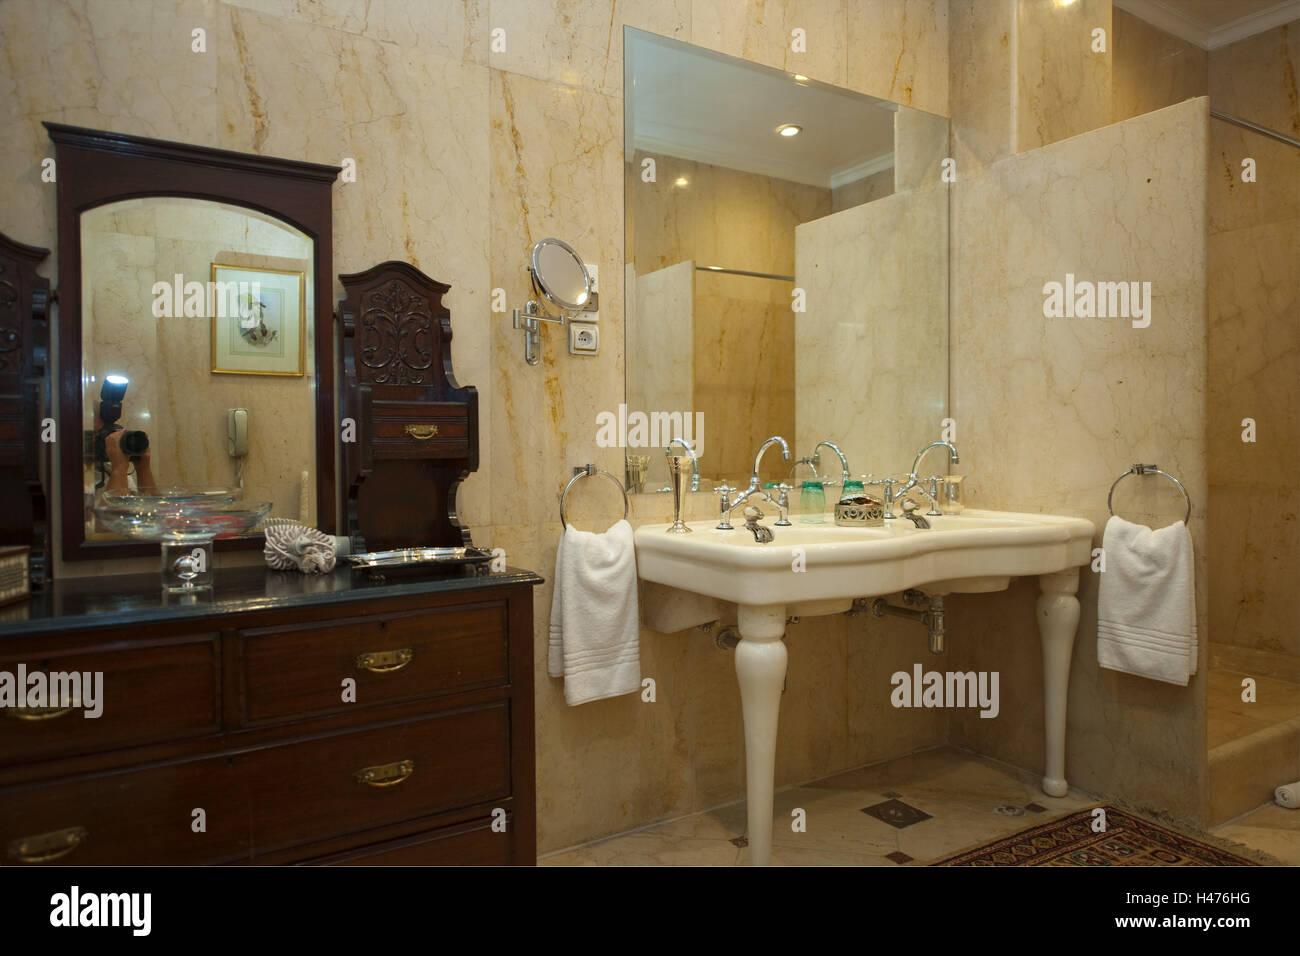 Bathroom Cabinets Egypt egypt, luxor, sofitel winter palace luxor, traditional five-star